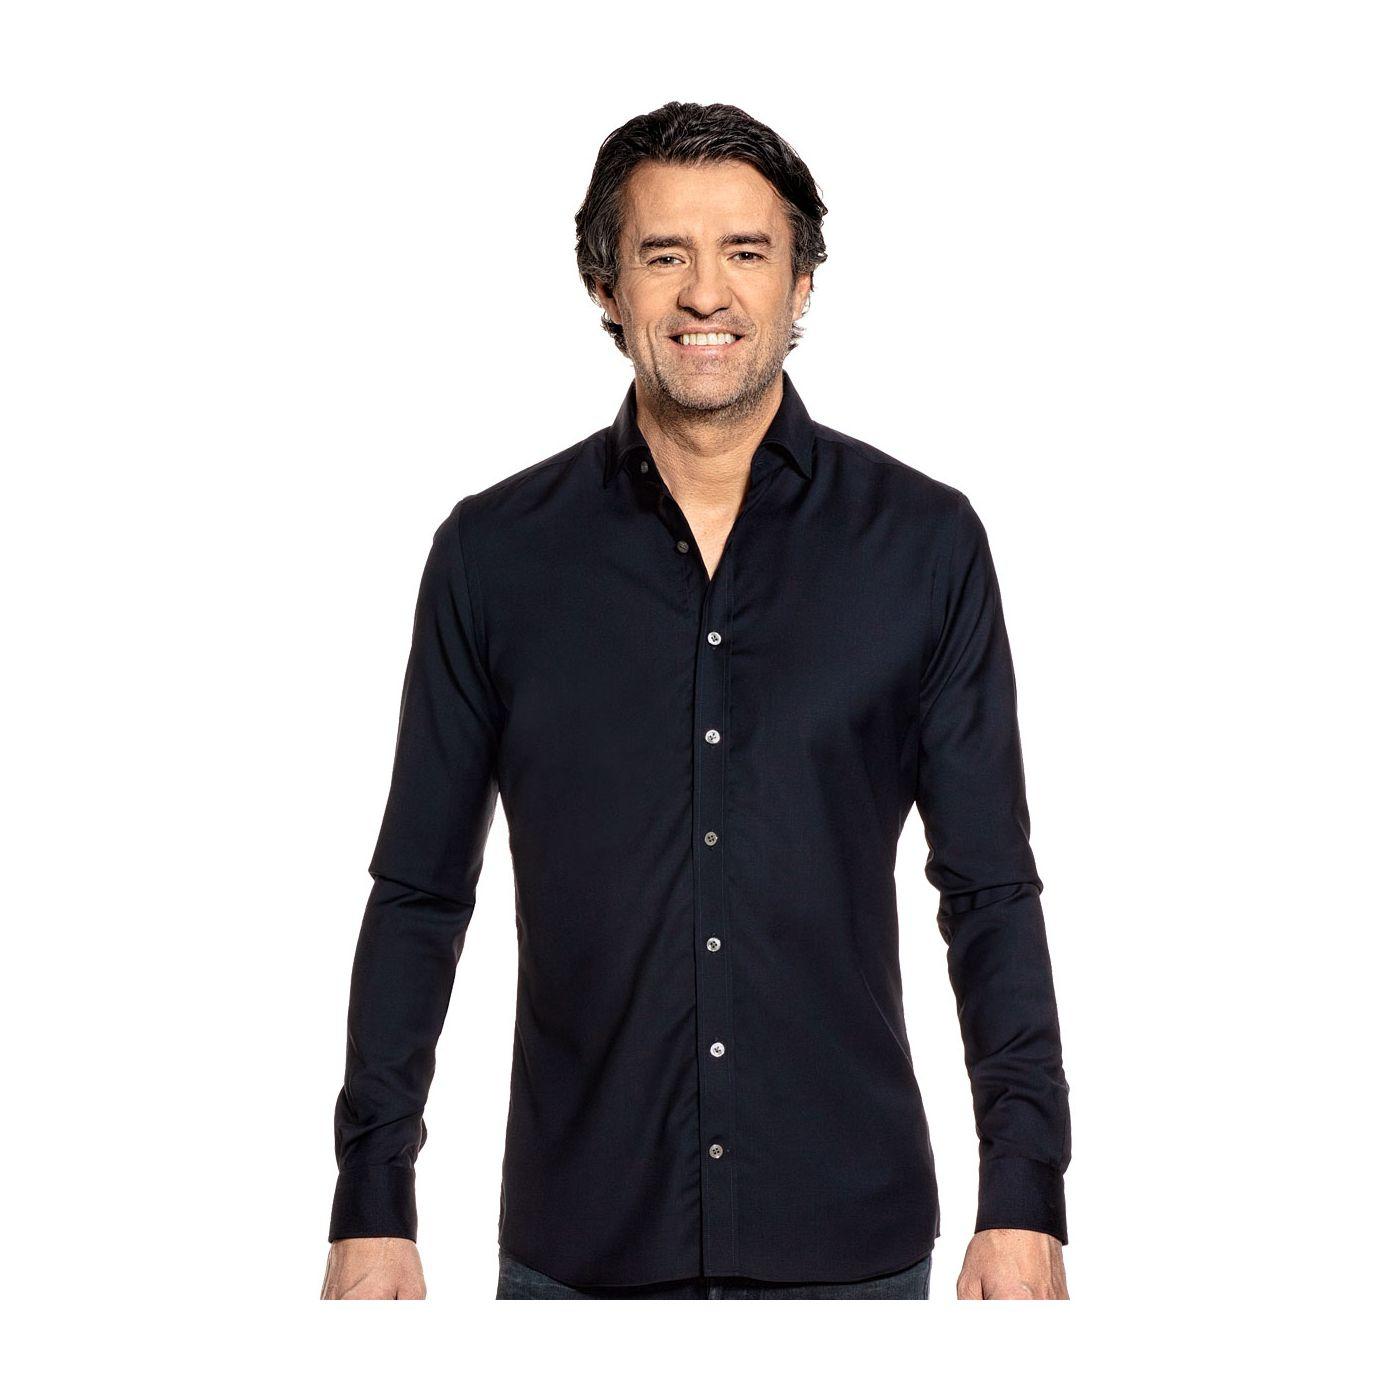 Joe Woven Shirt Very Dark Navy